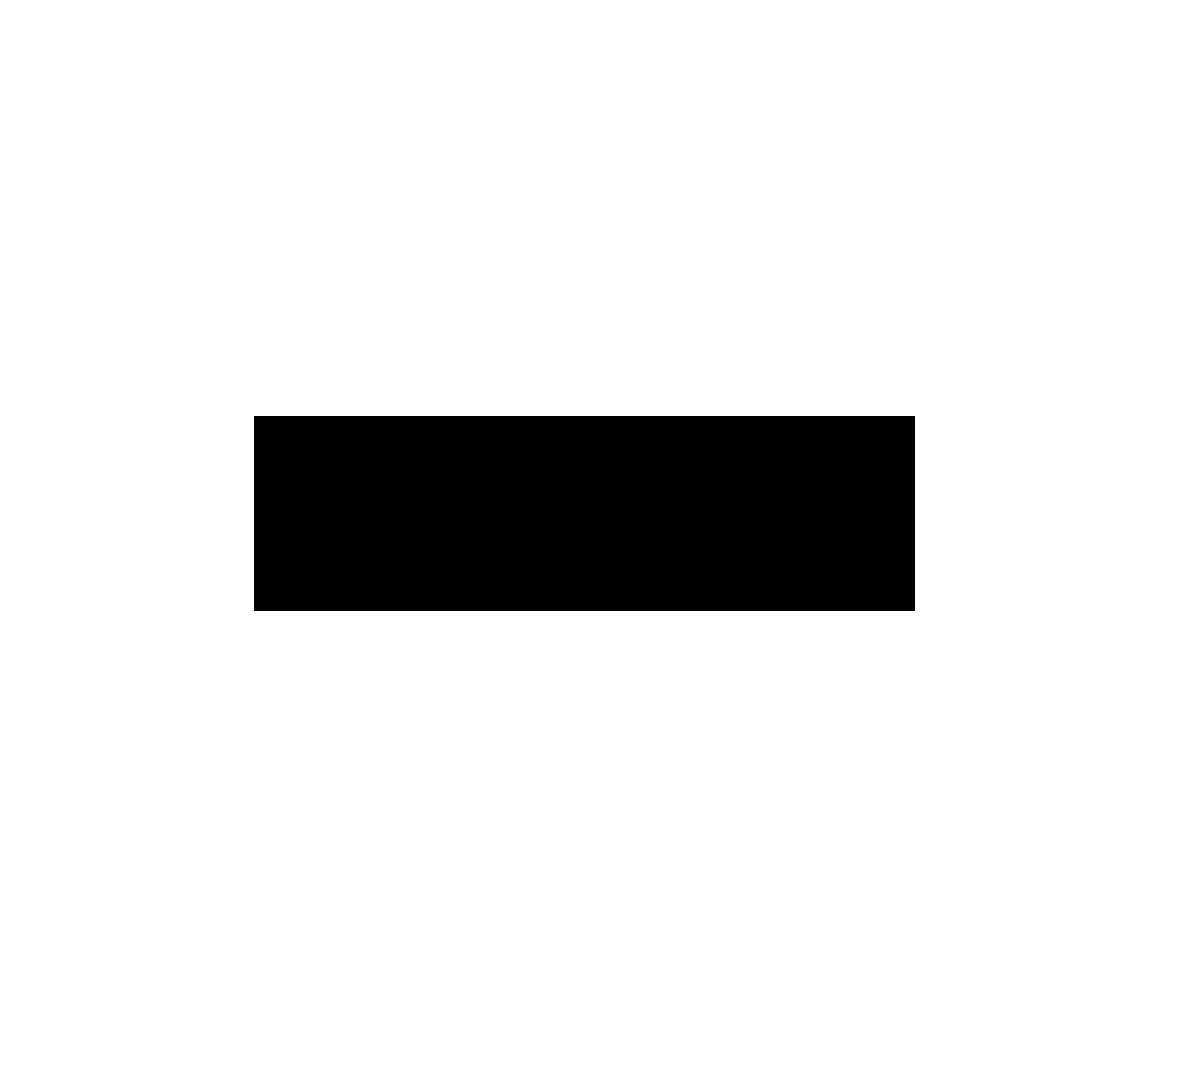 Solana-logo-transparent.png